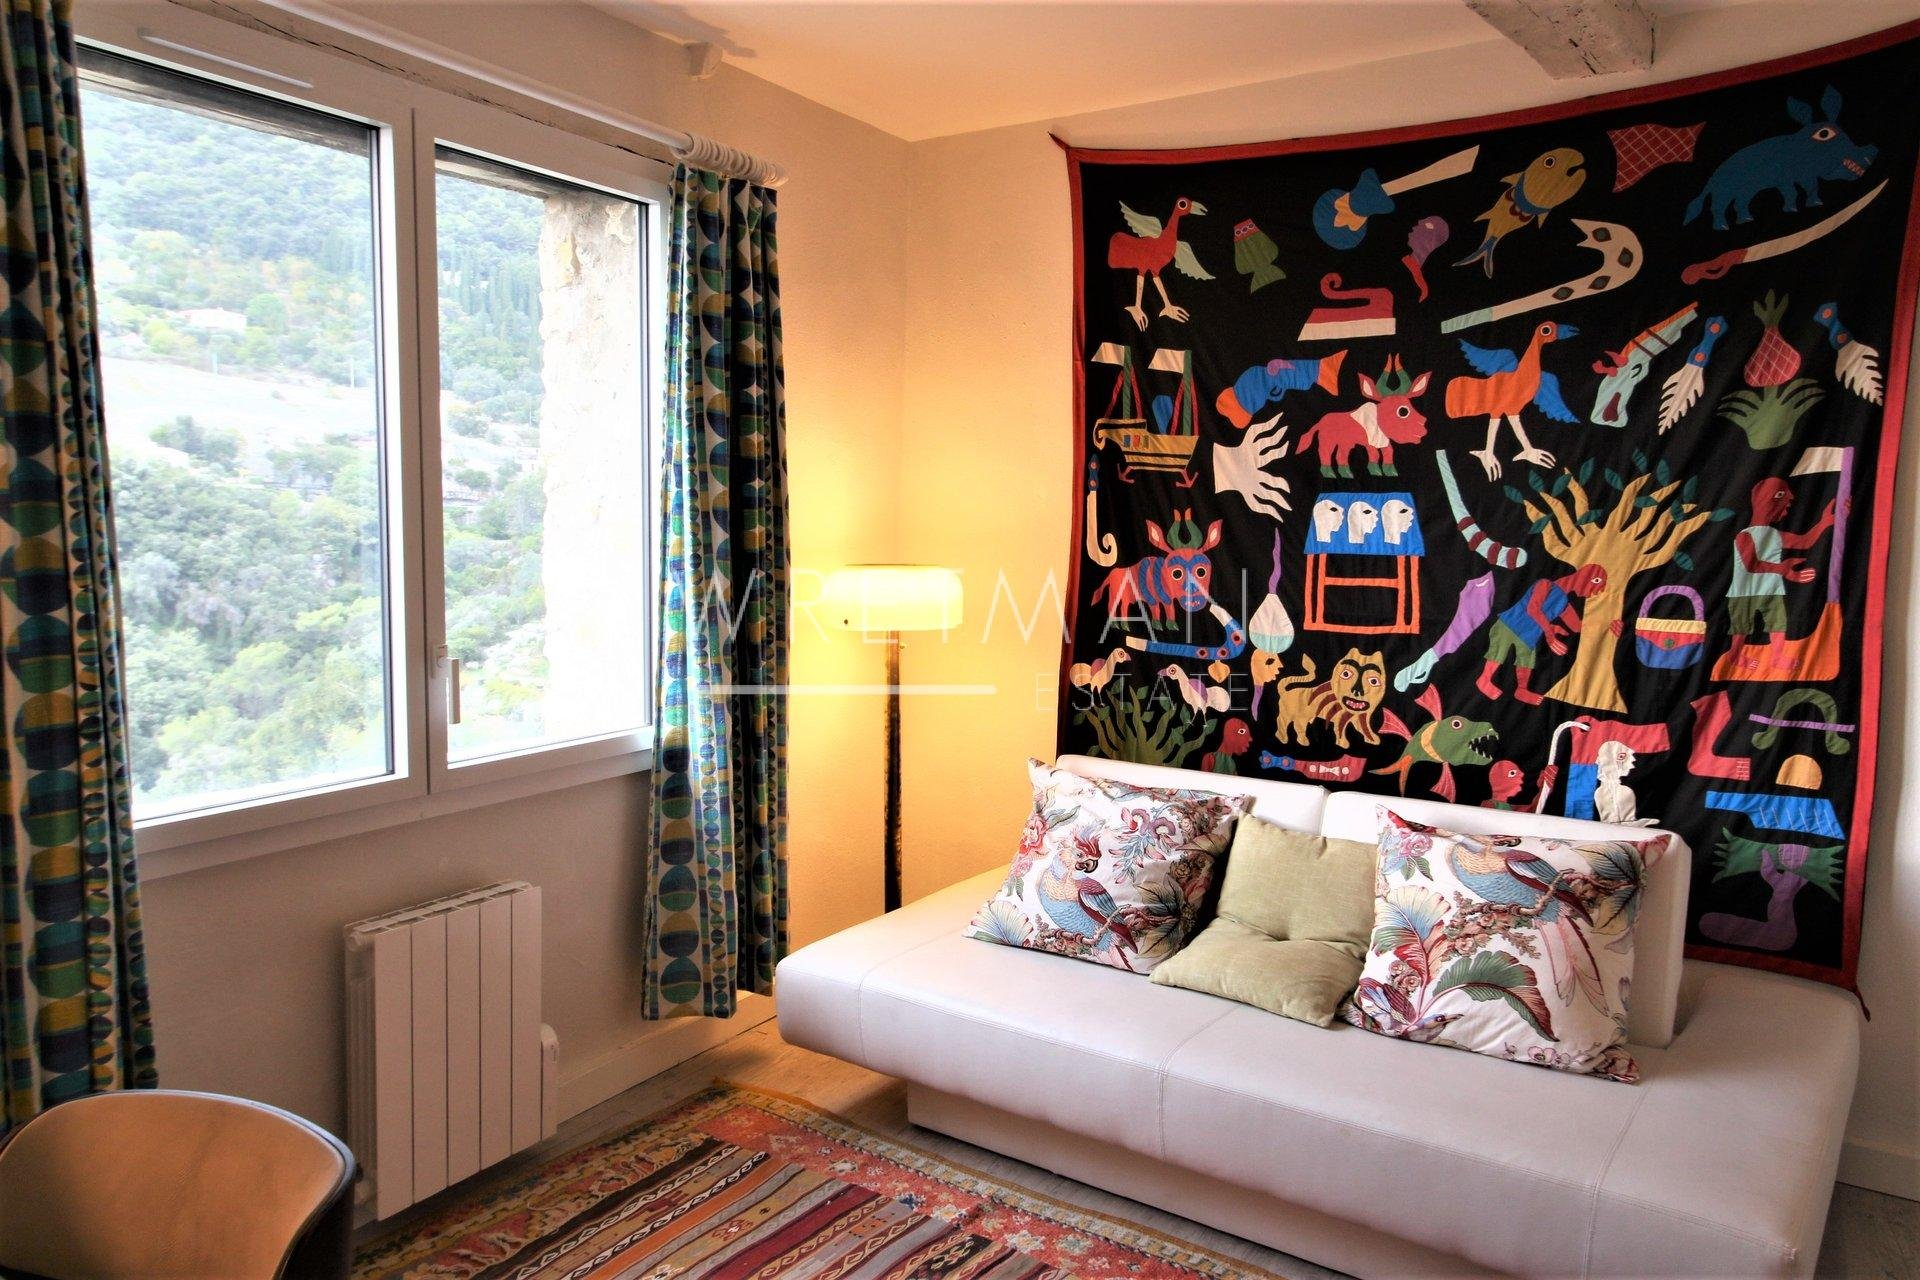 Charmig  2 sovrum bylägenhet - Tourettes-sur-Loup